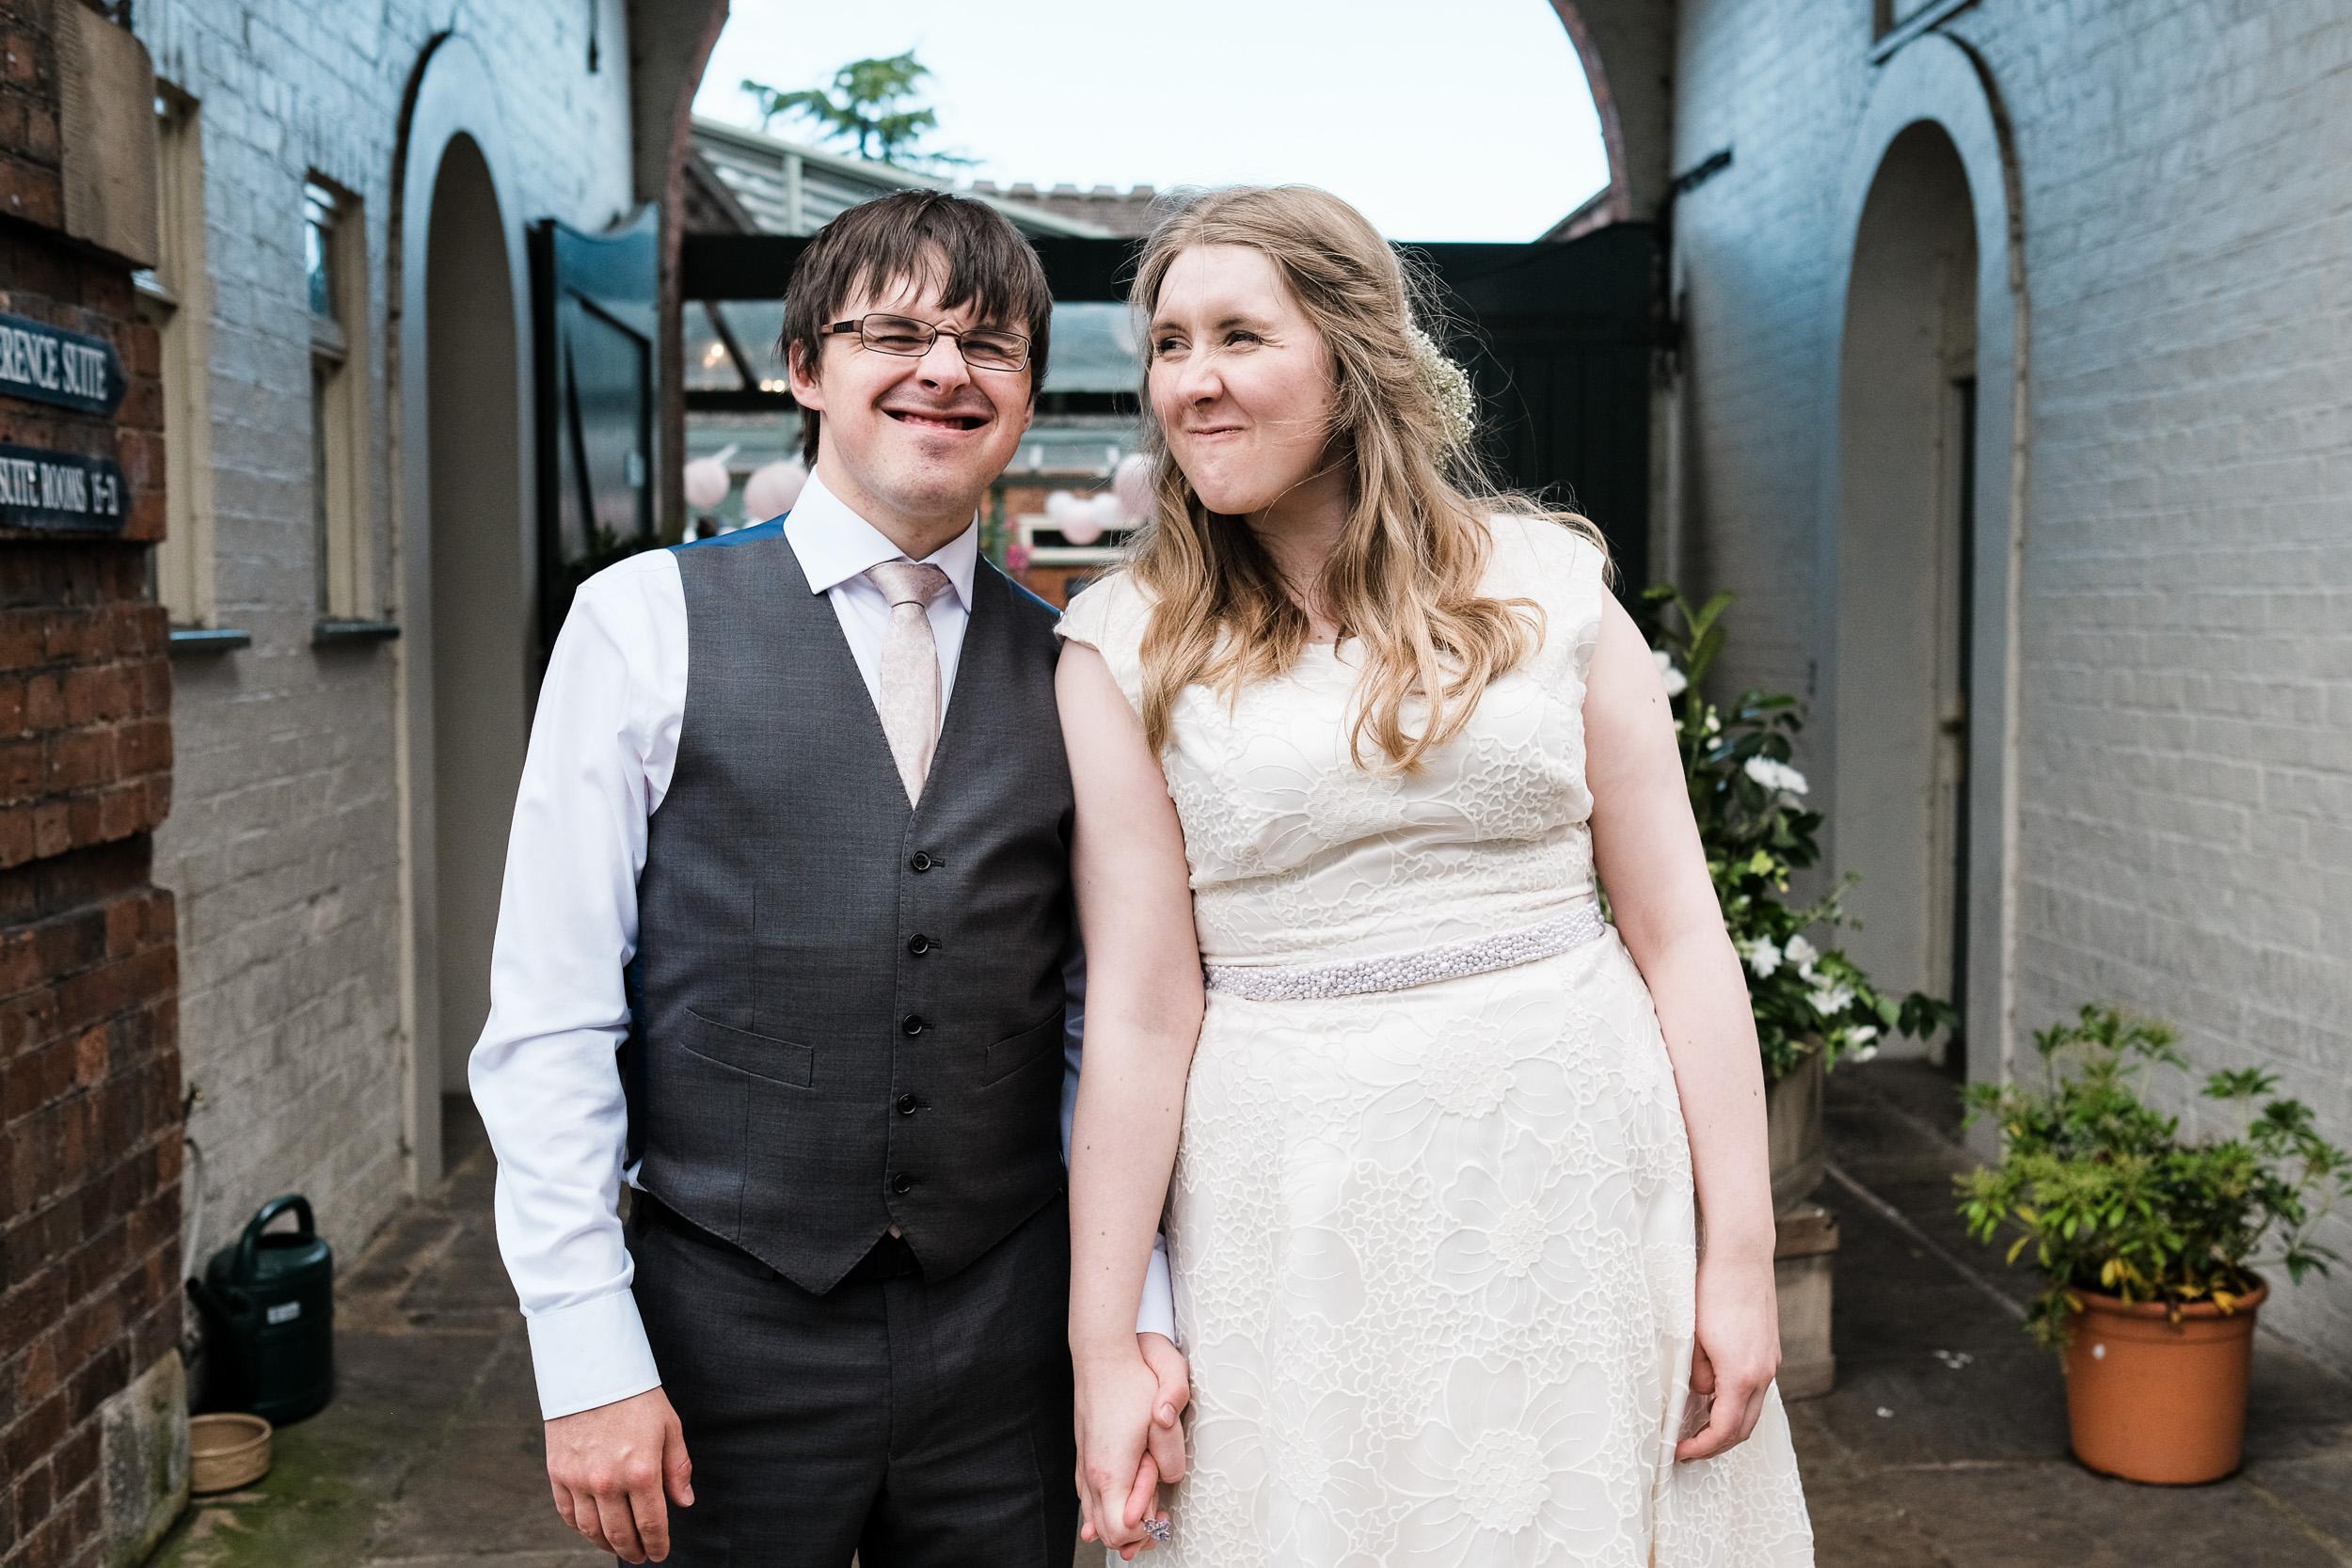 Shropshire Wedding Photographer-001-AXT28363.jpg